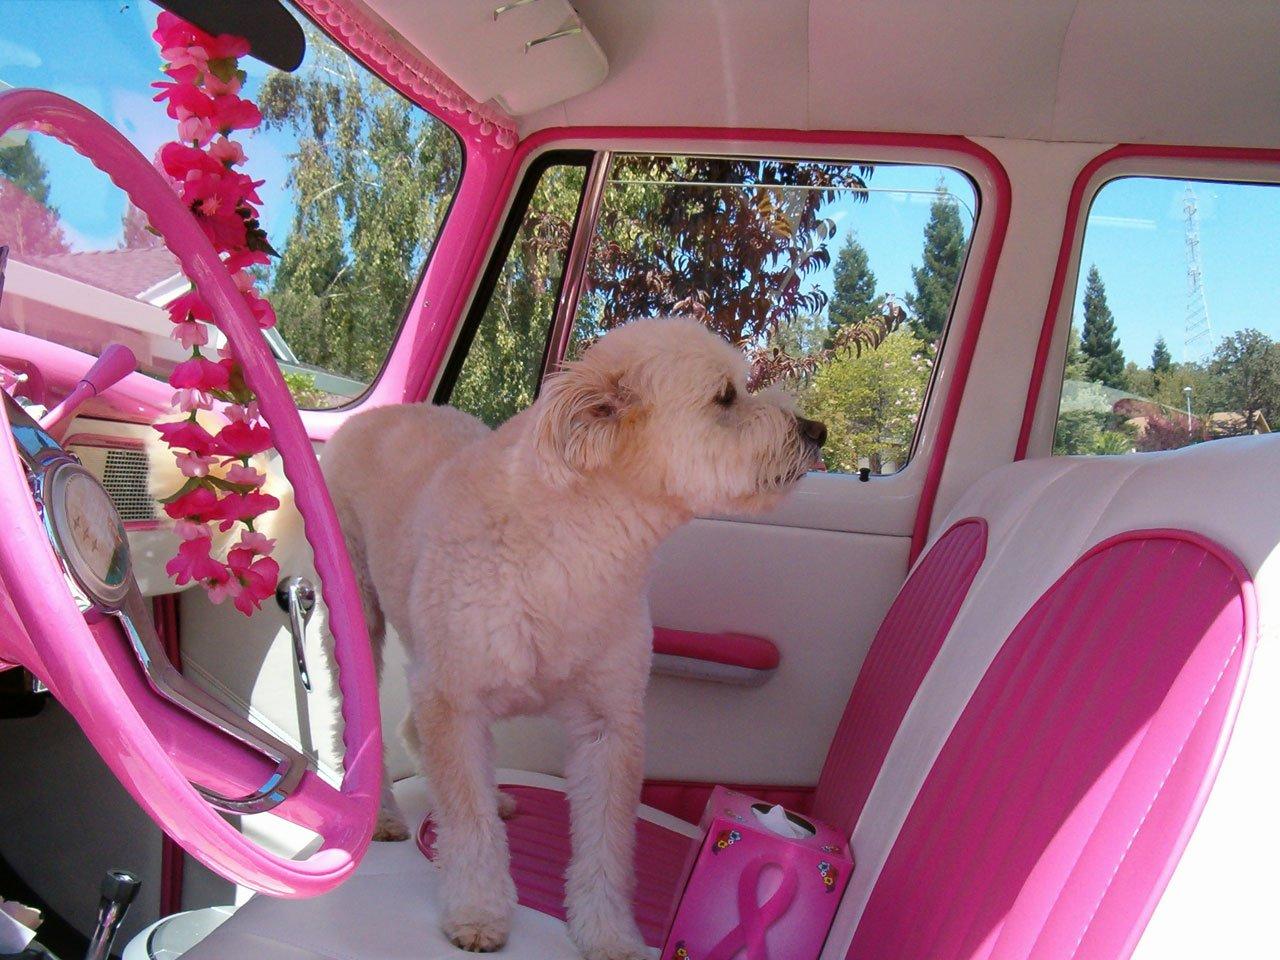 Free Images Car Retro Flower Interior Cute Pet Ride Decor